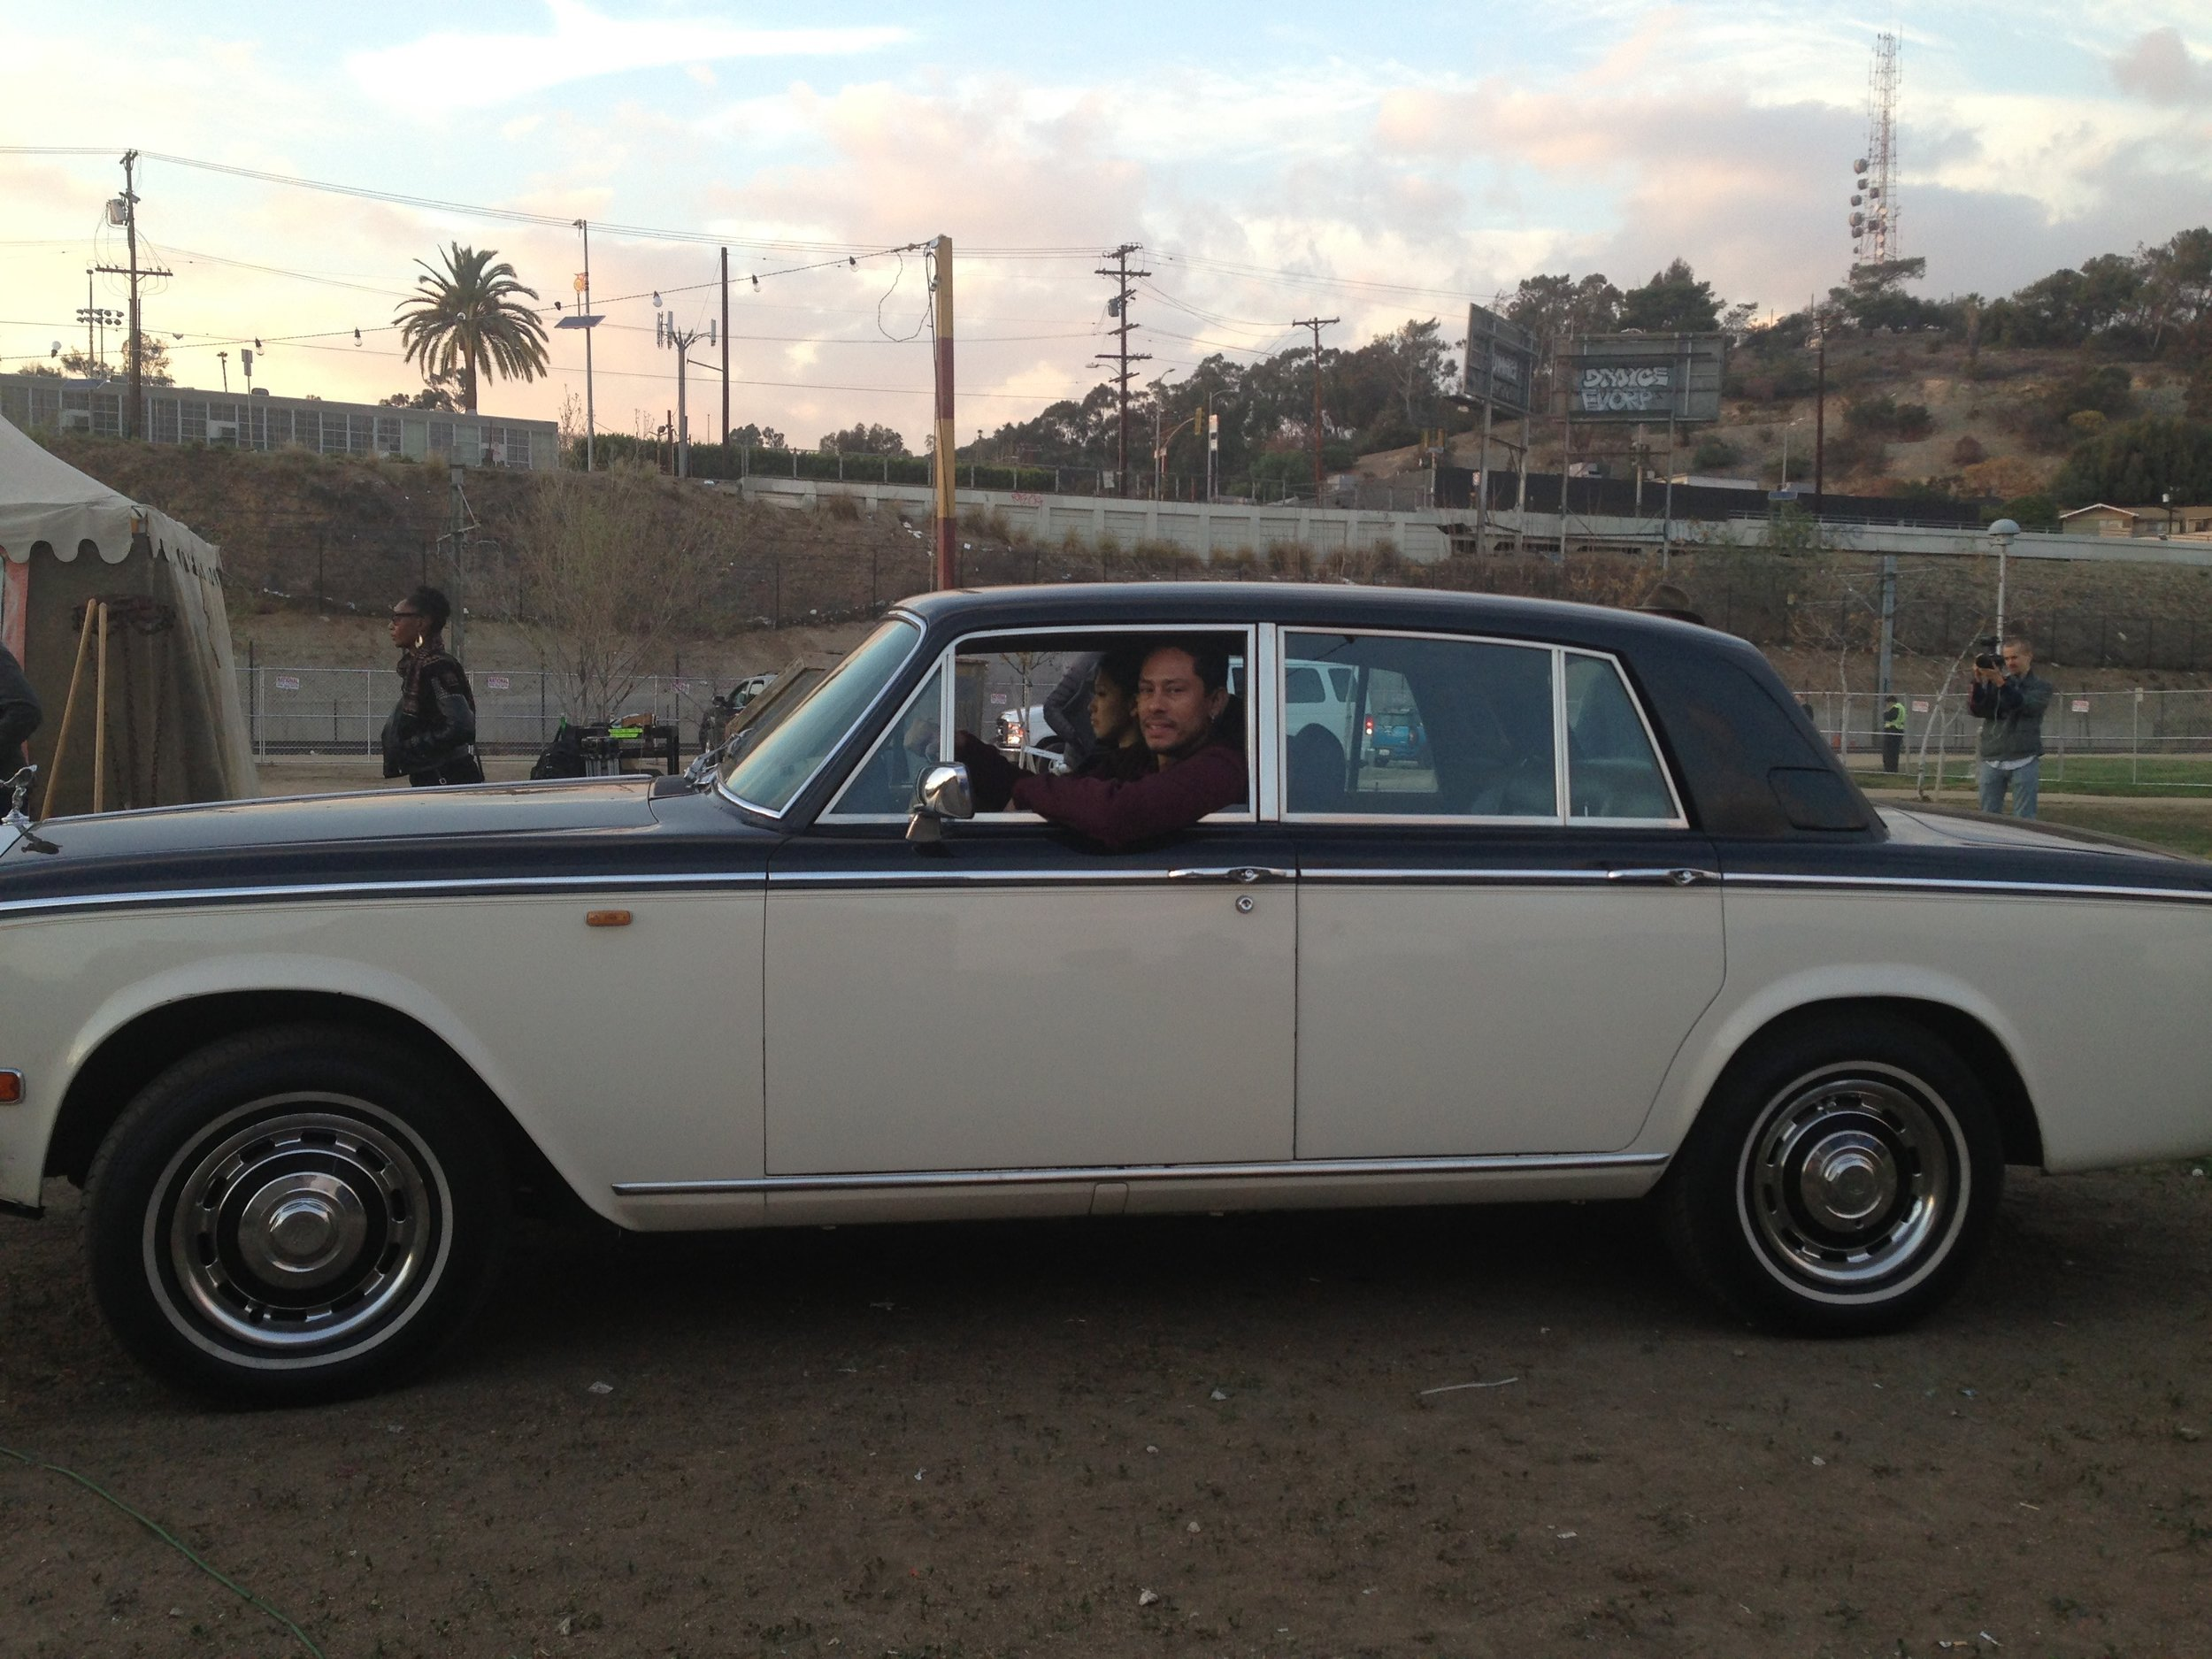 Our Costume Designer, Bea Åkerlund loaned us her car for the shoot.